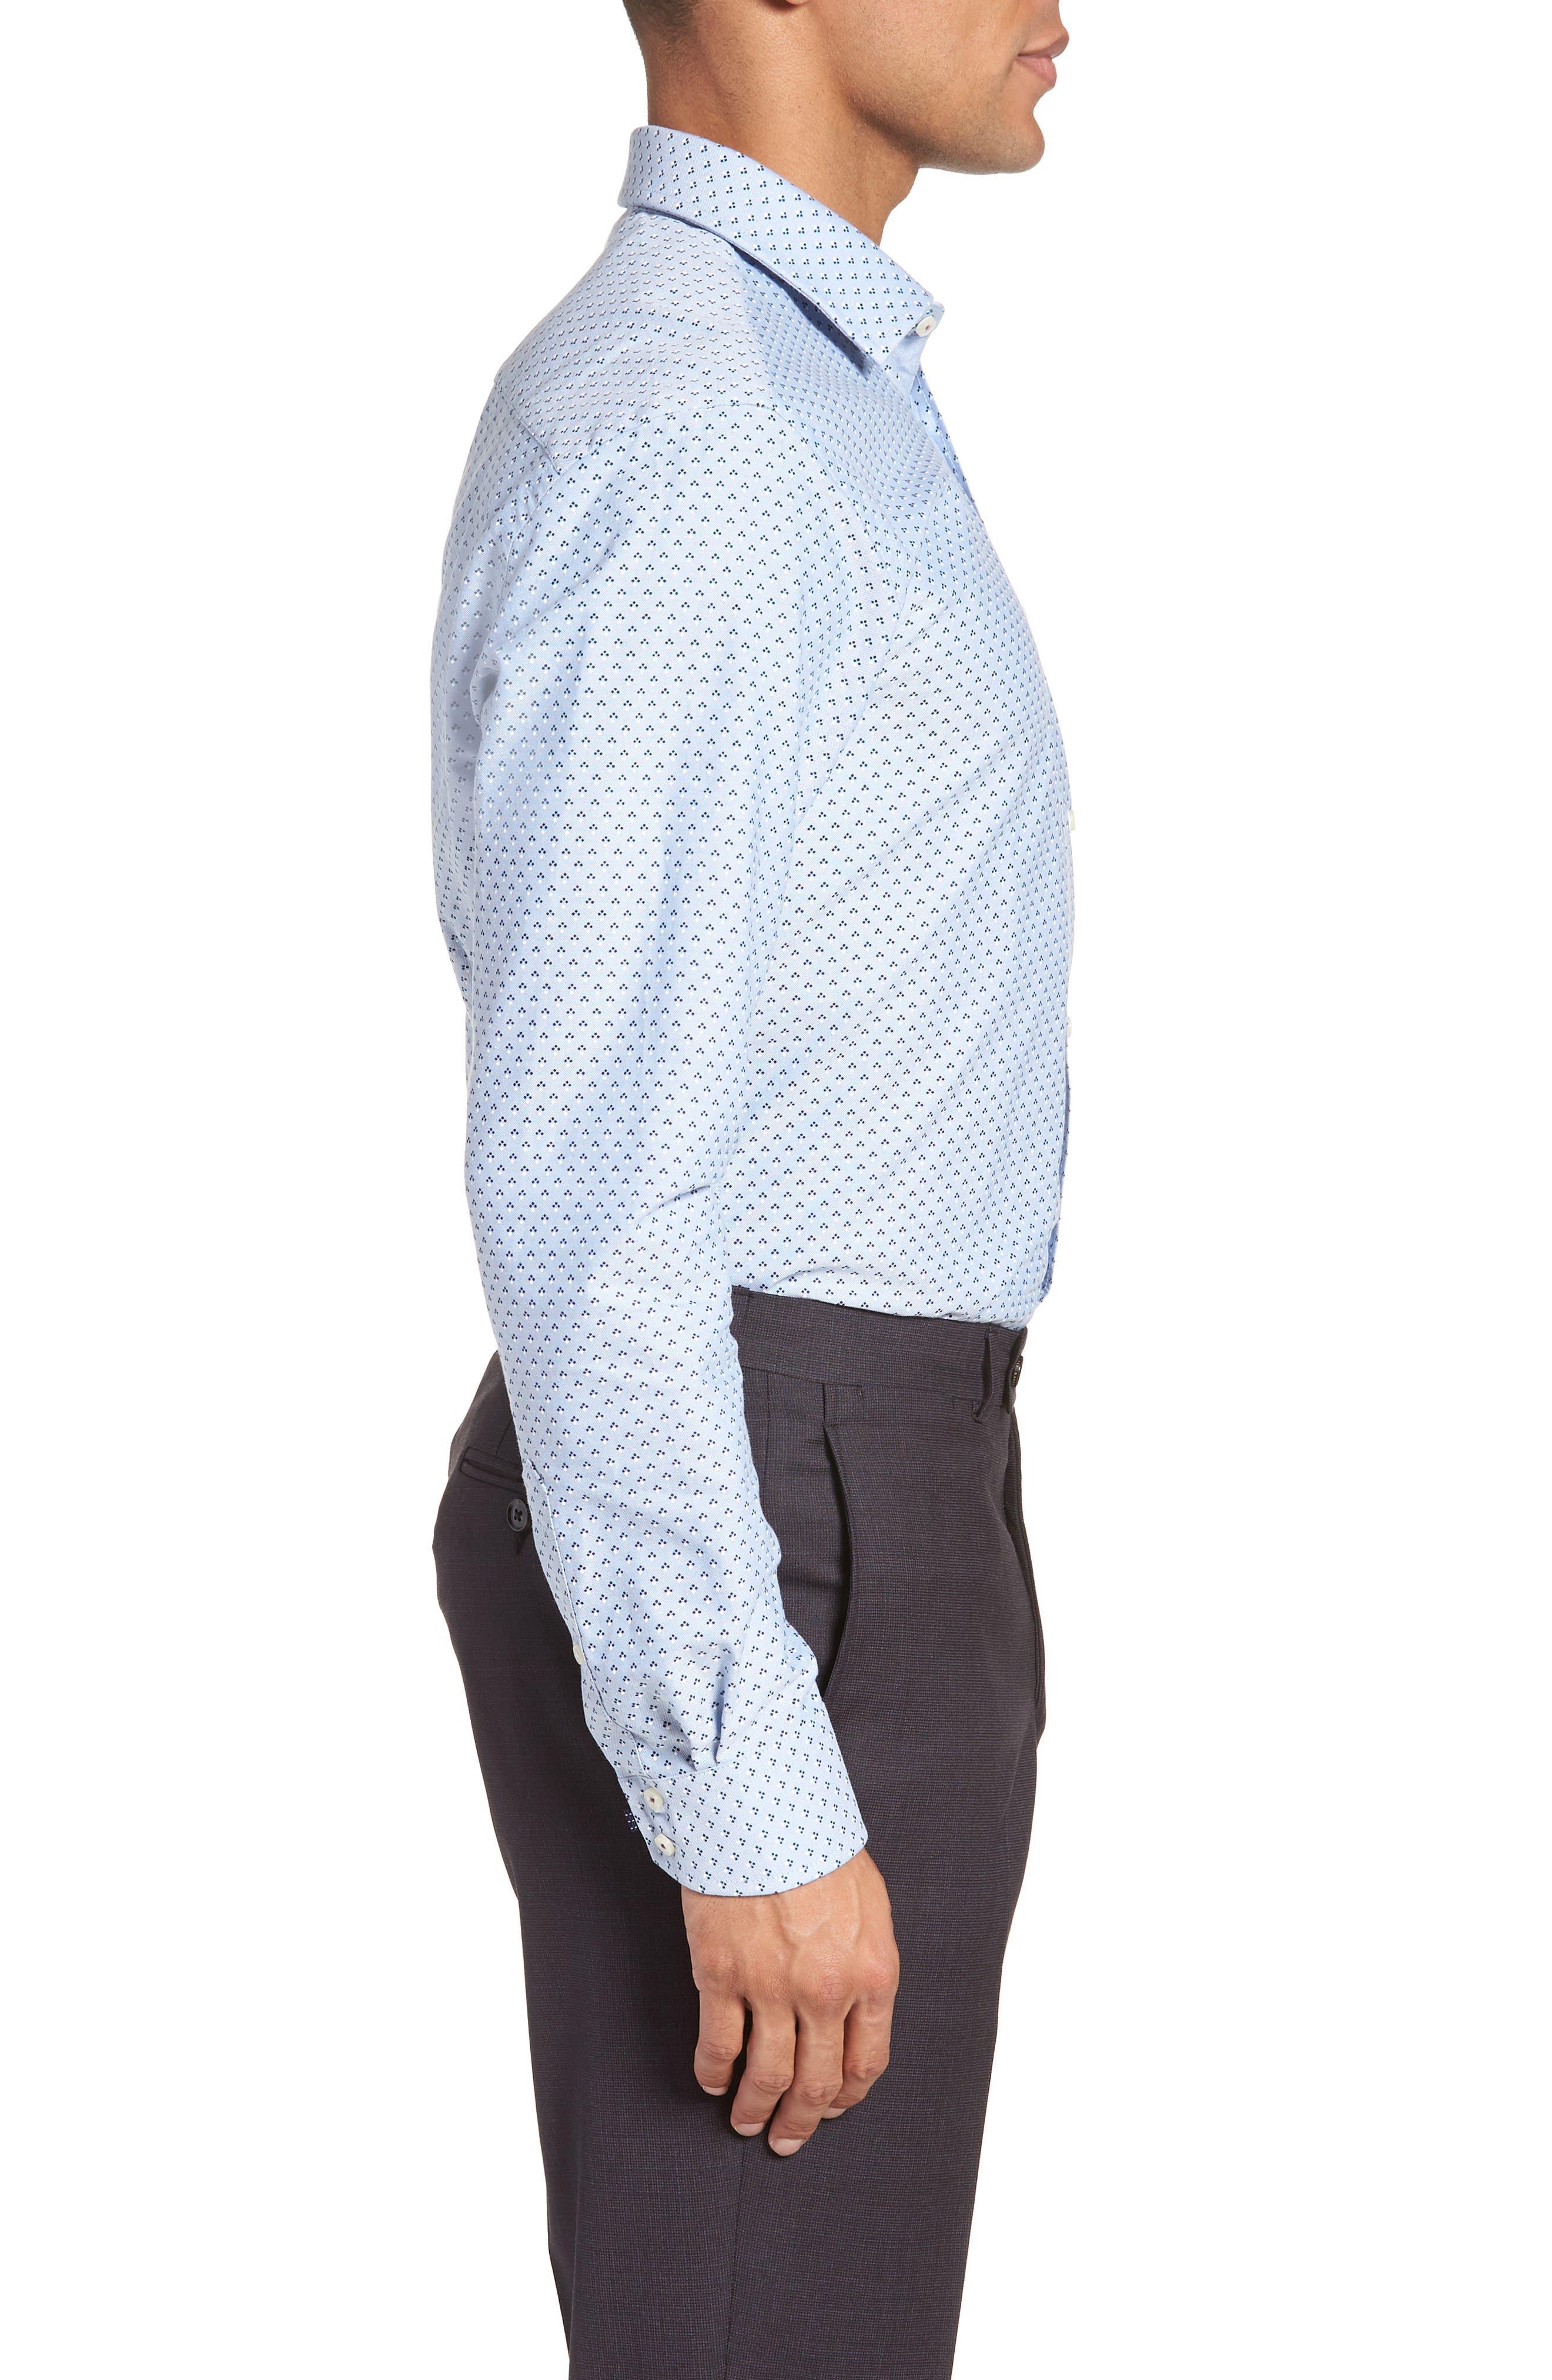 Forestr Trim Fit Geometric Dress Shirt,                             Alternate thumbnail 4, color,                             421